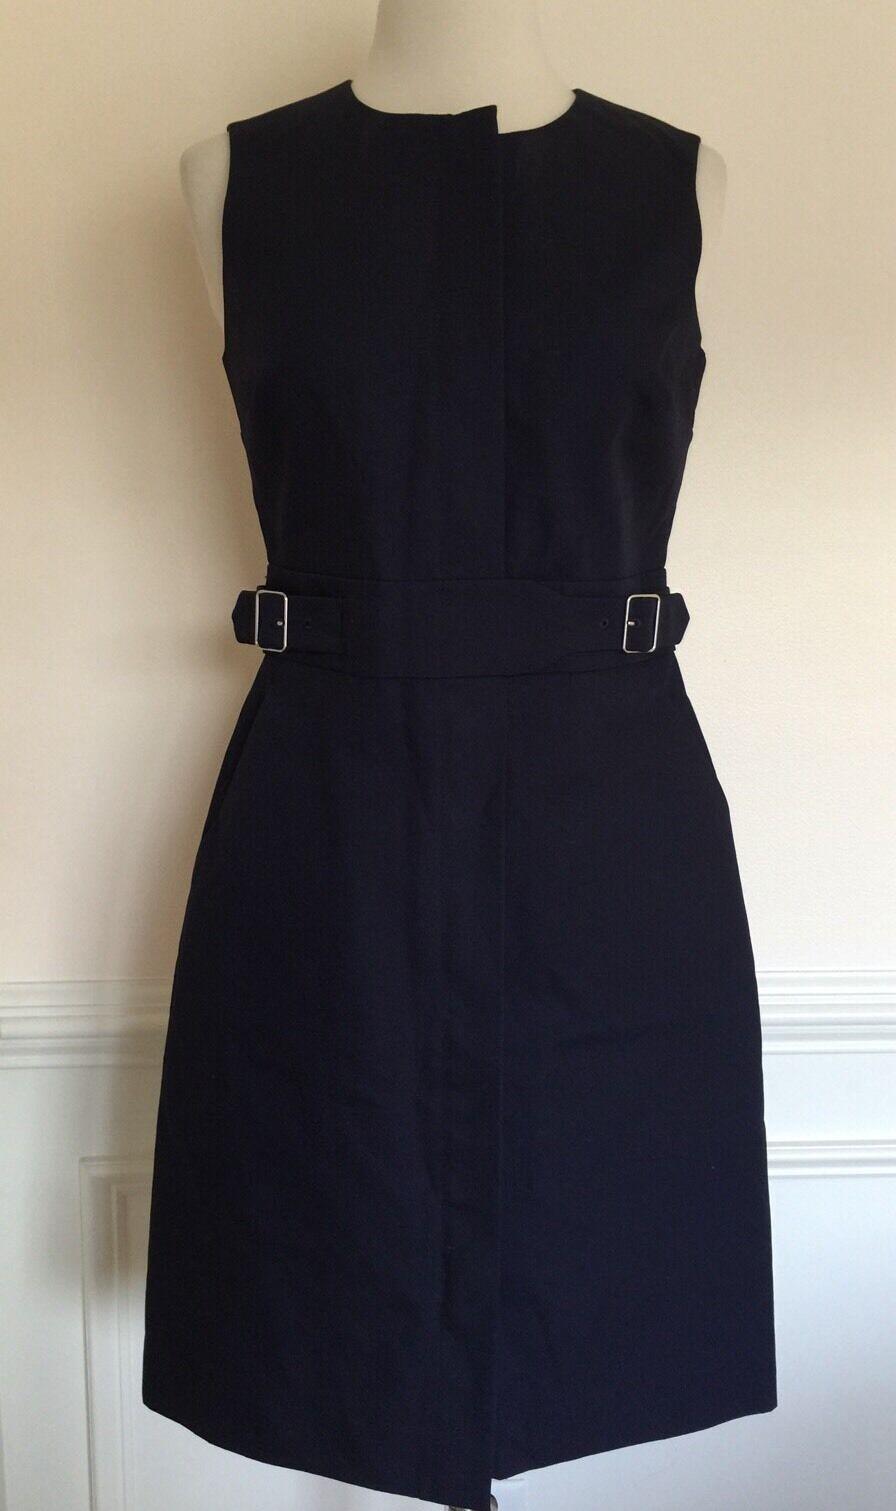 NEW JCREW Zip Front Sleeveless Dress 0 NAVY G2717 SPRING '17